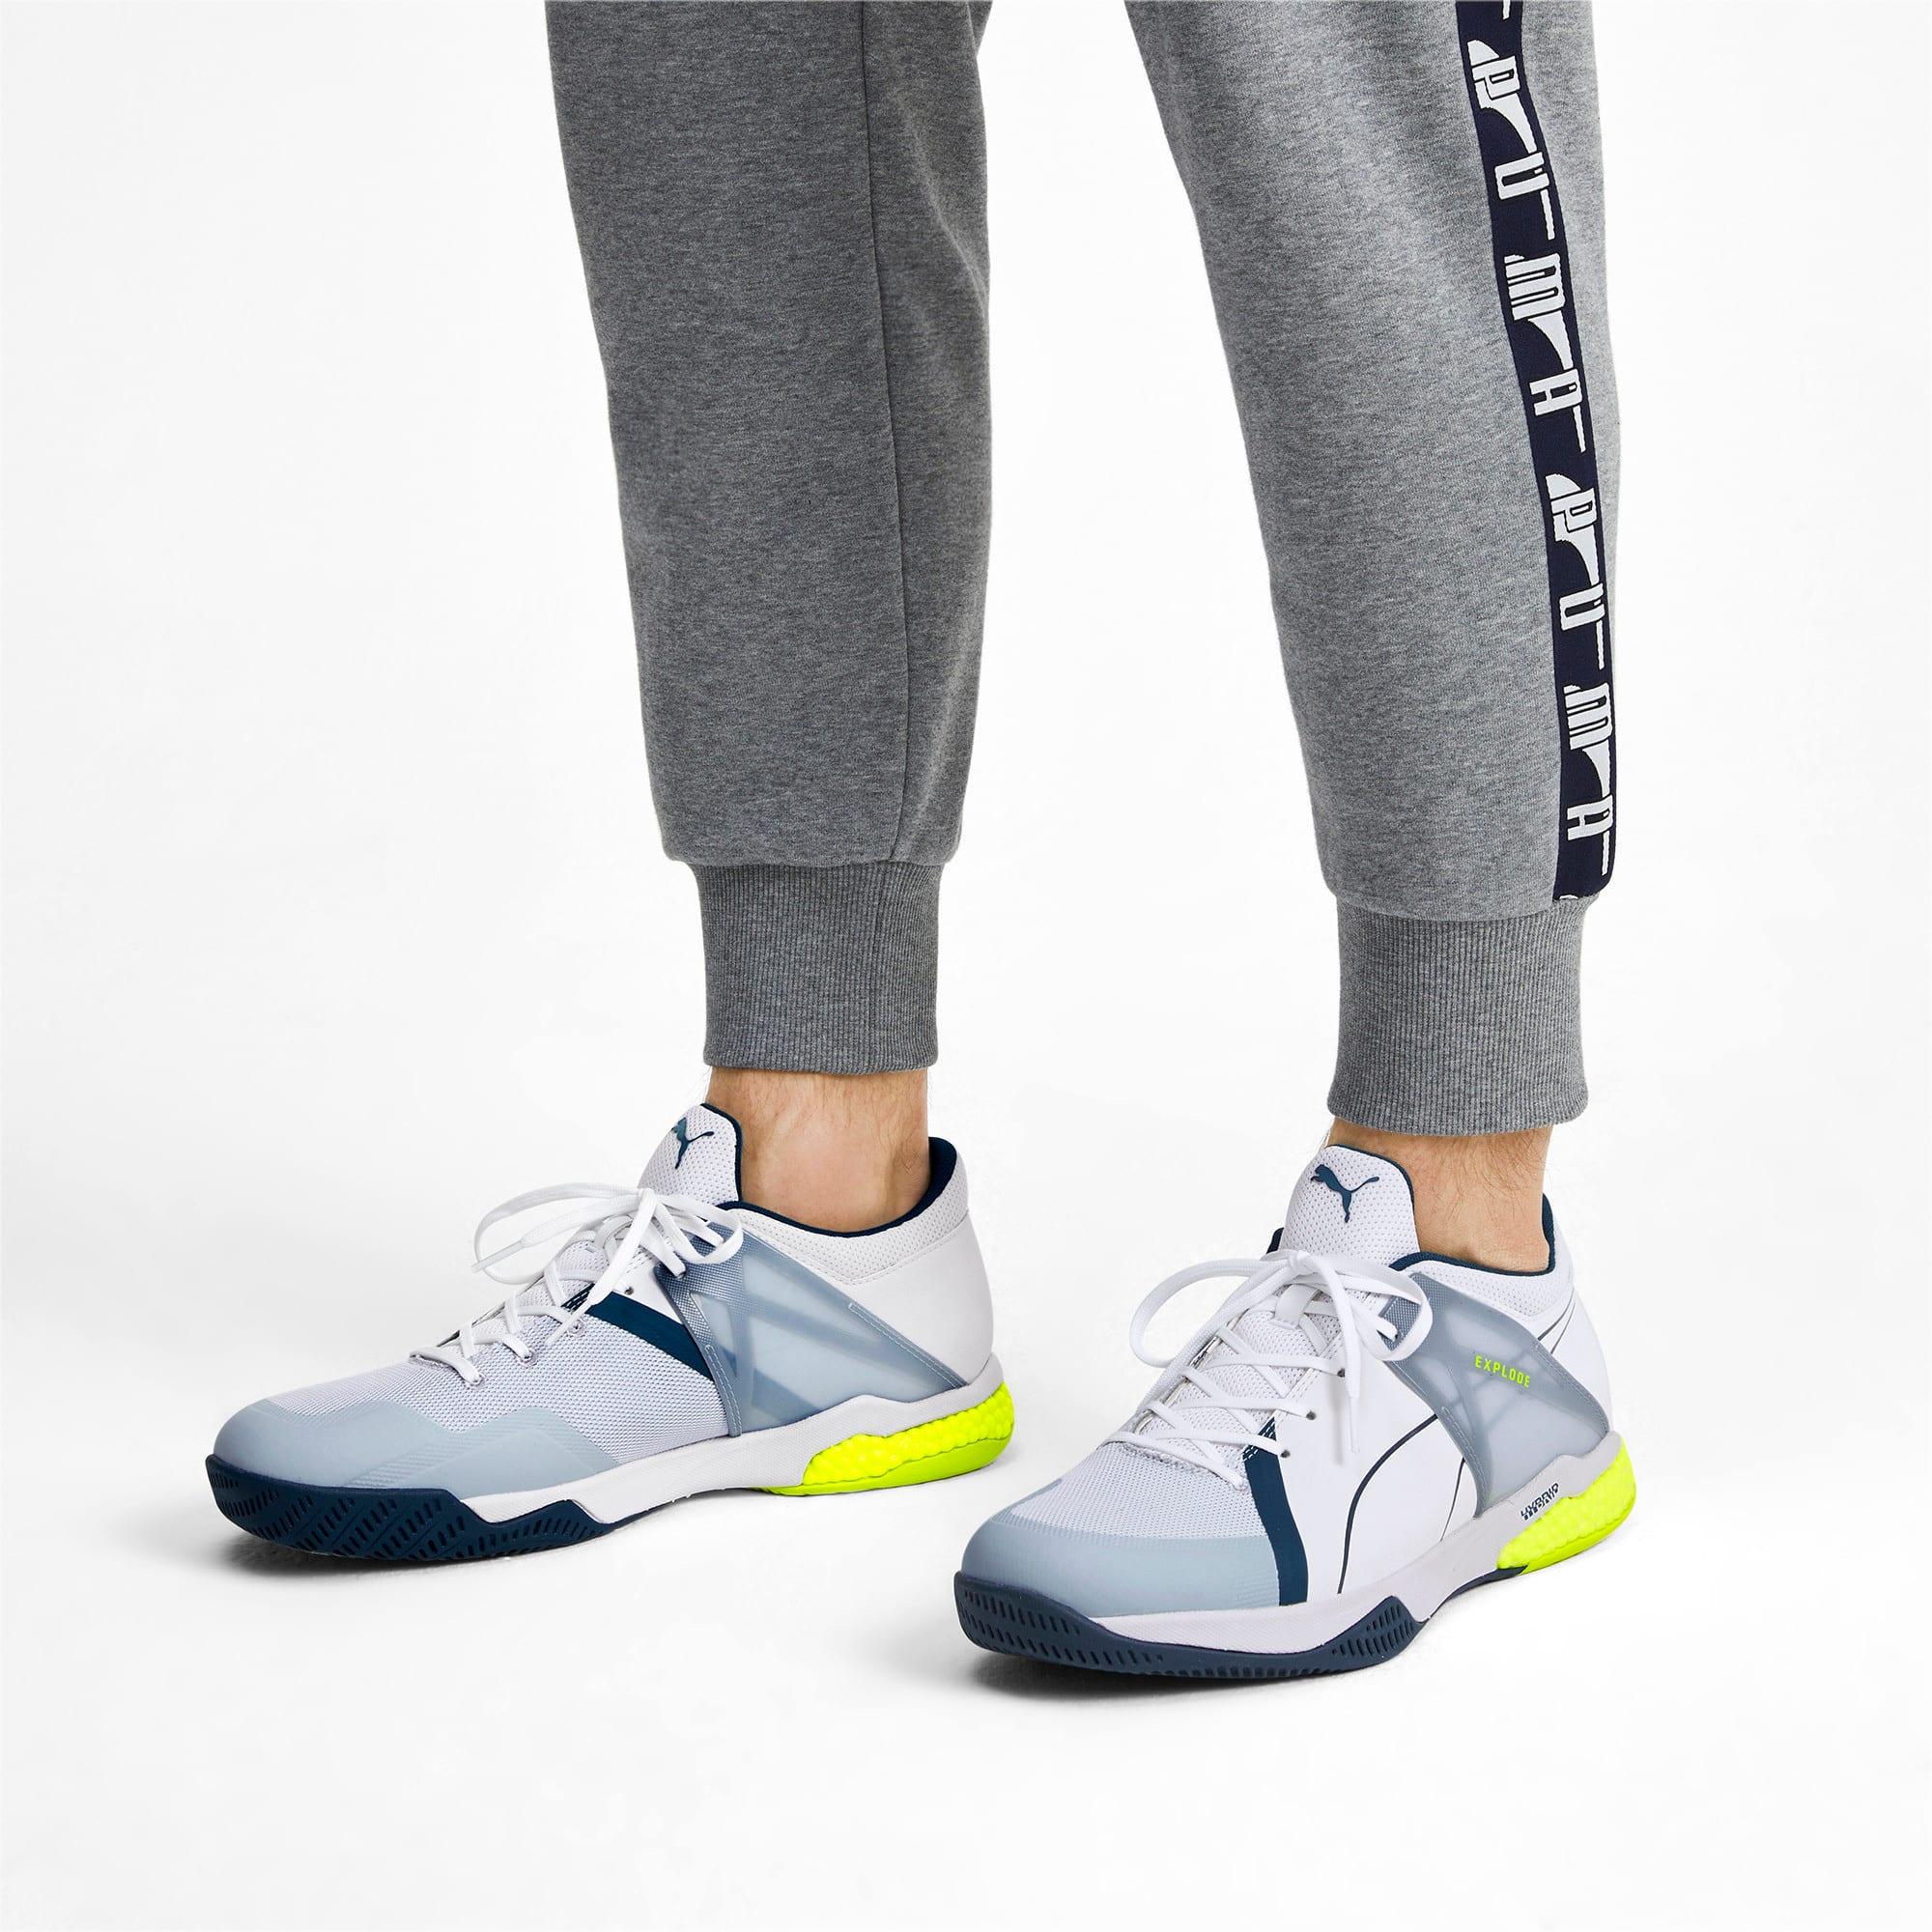 Thumbnail 2 of Explode XT Hybrid 2 Handball Shoes, White-Grey-Yellow-Gibraltar, medium-IND